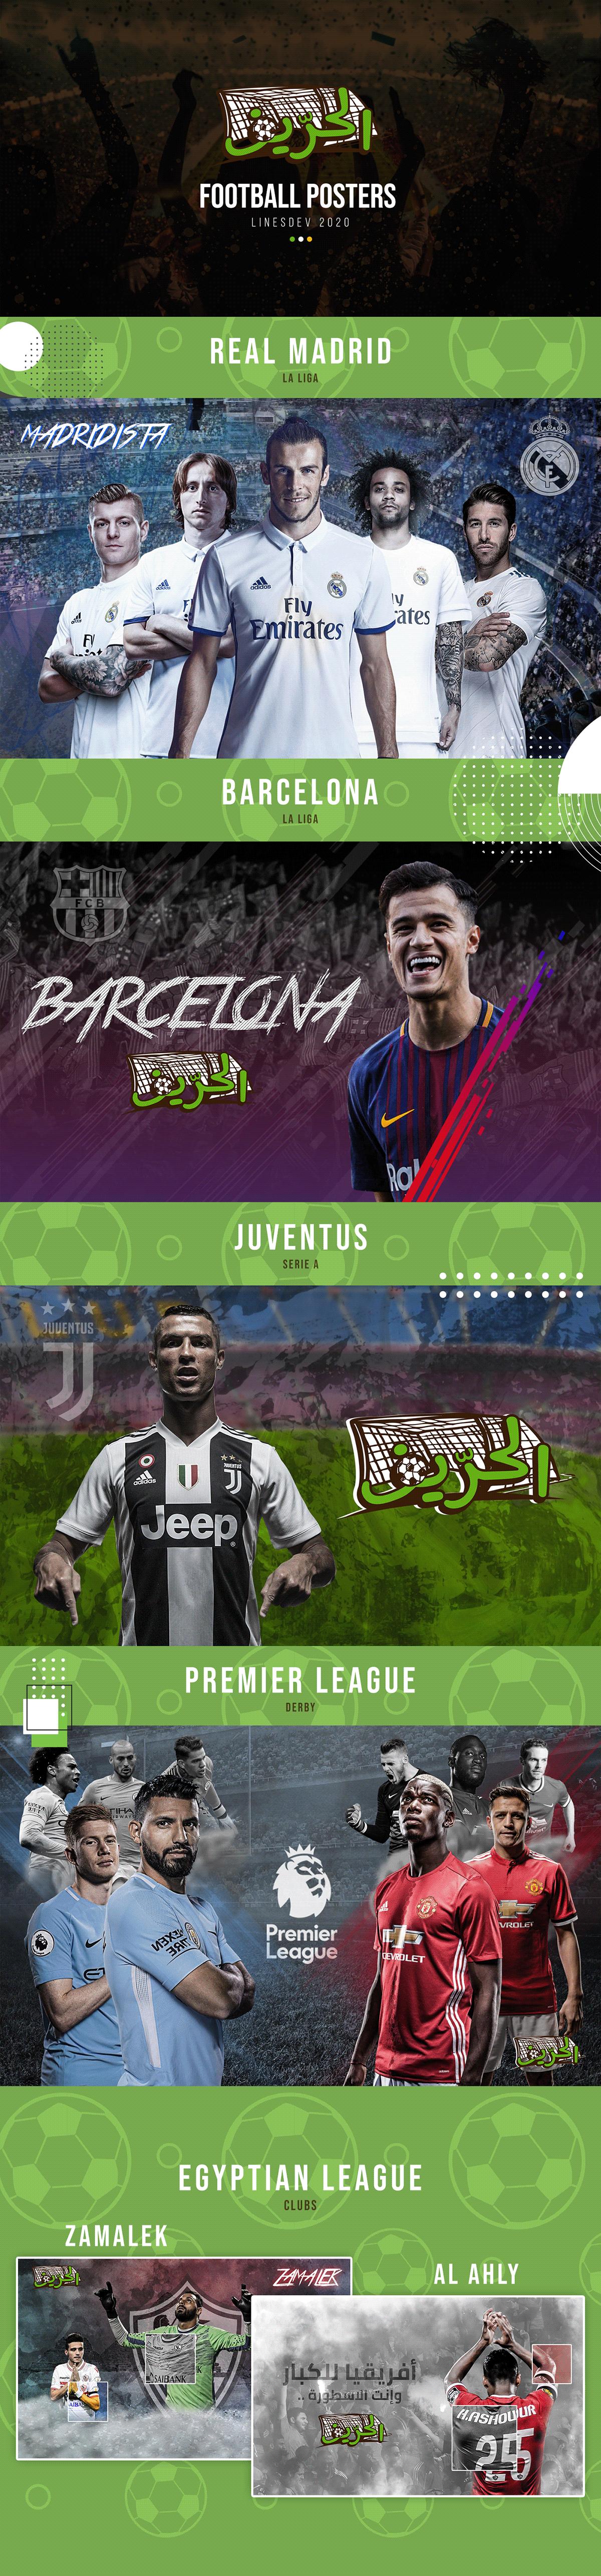 alhareef ball football posters branding  bundesliga campaign graphic design  laliga Premier League